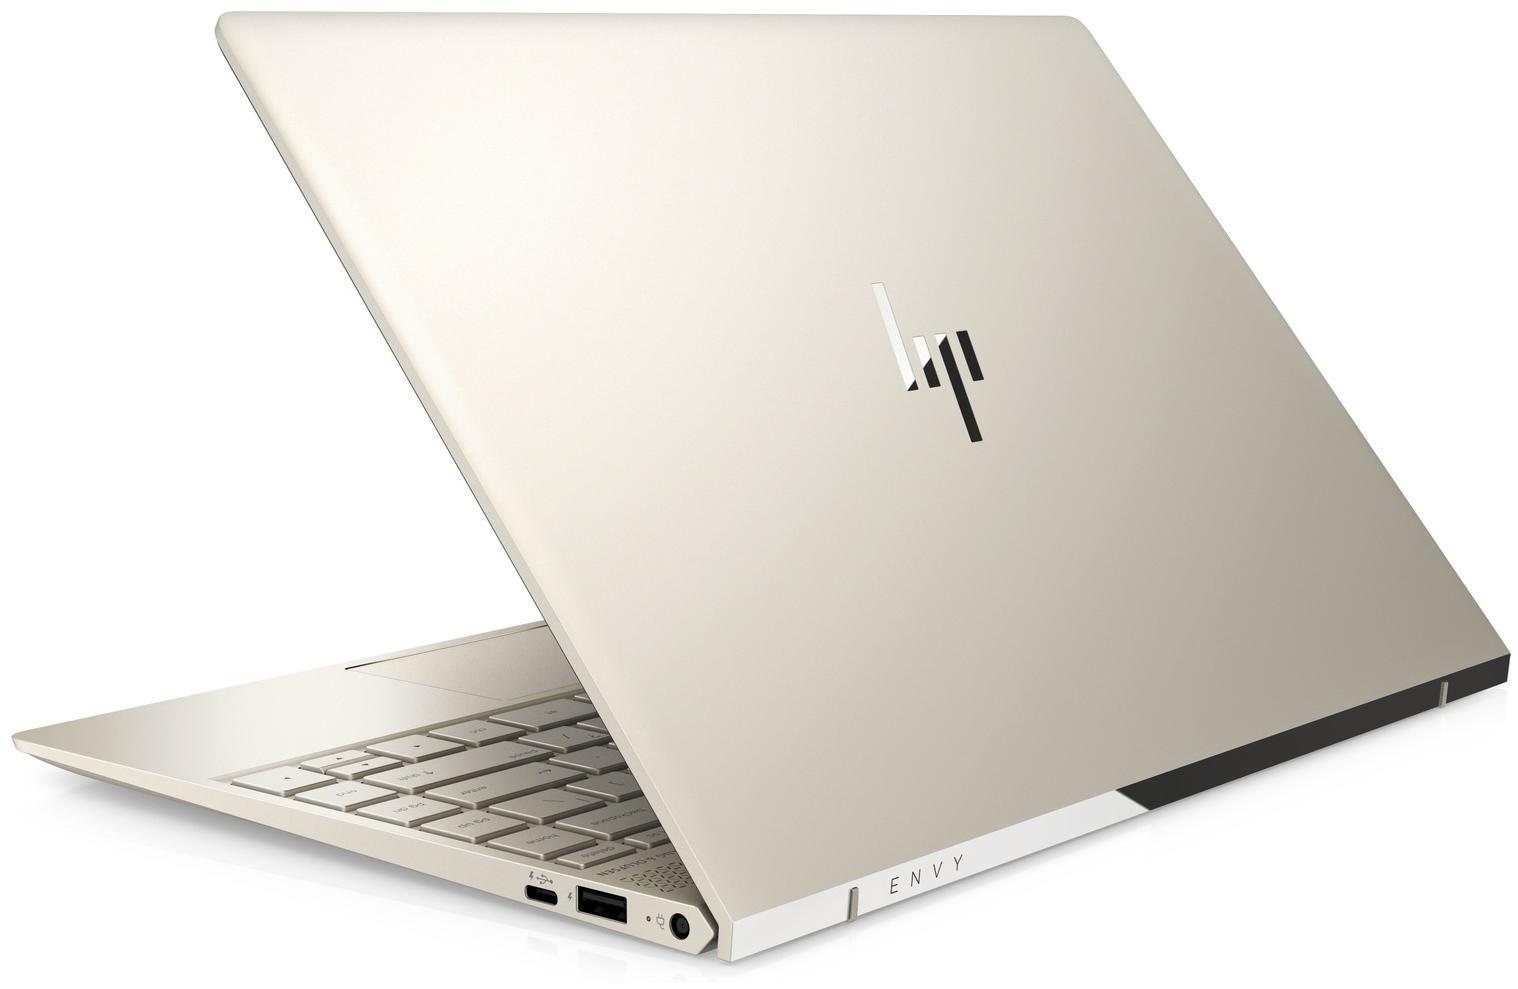 Купить Ноутбук HP Envy 13-ah0001ur (4GU40EA) фото 2